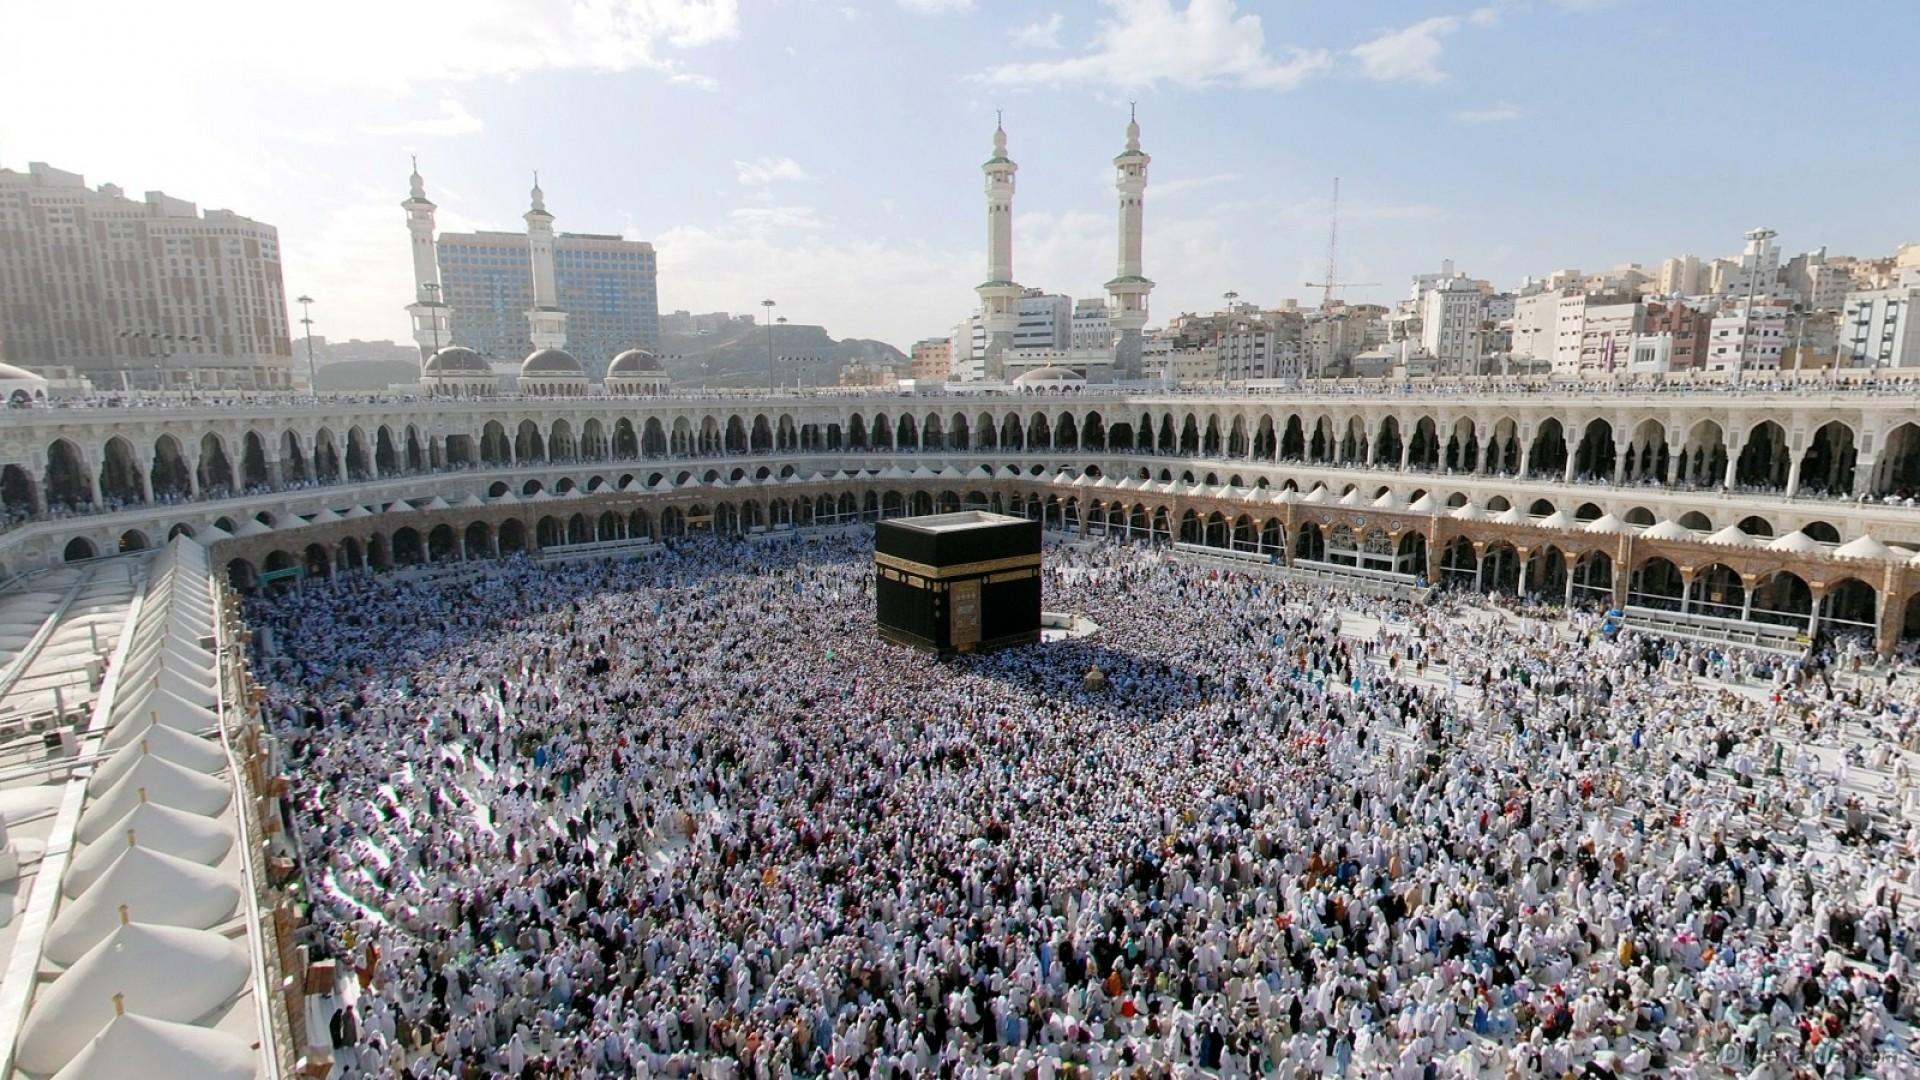 Mecca HD Wallpaper 70 images 1920x1080